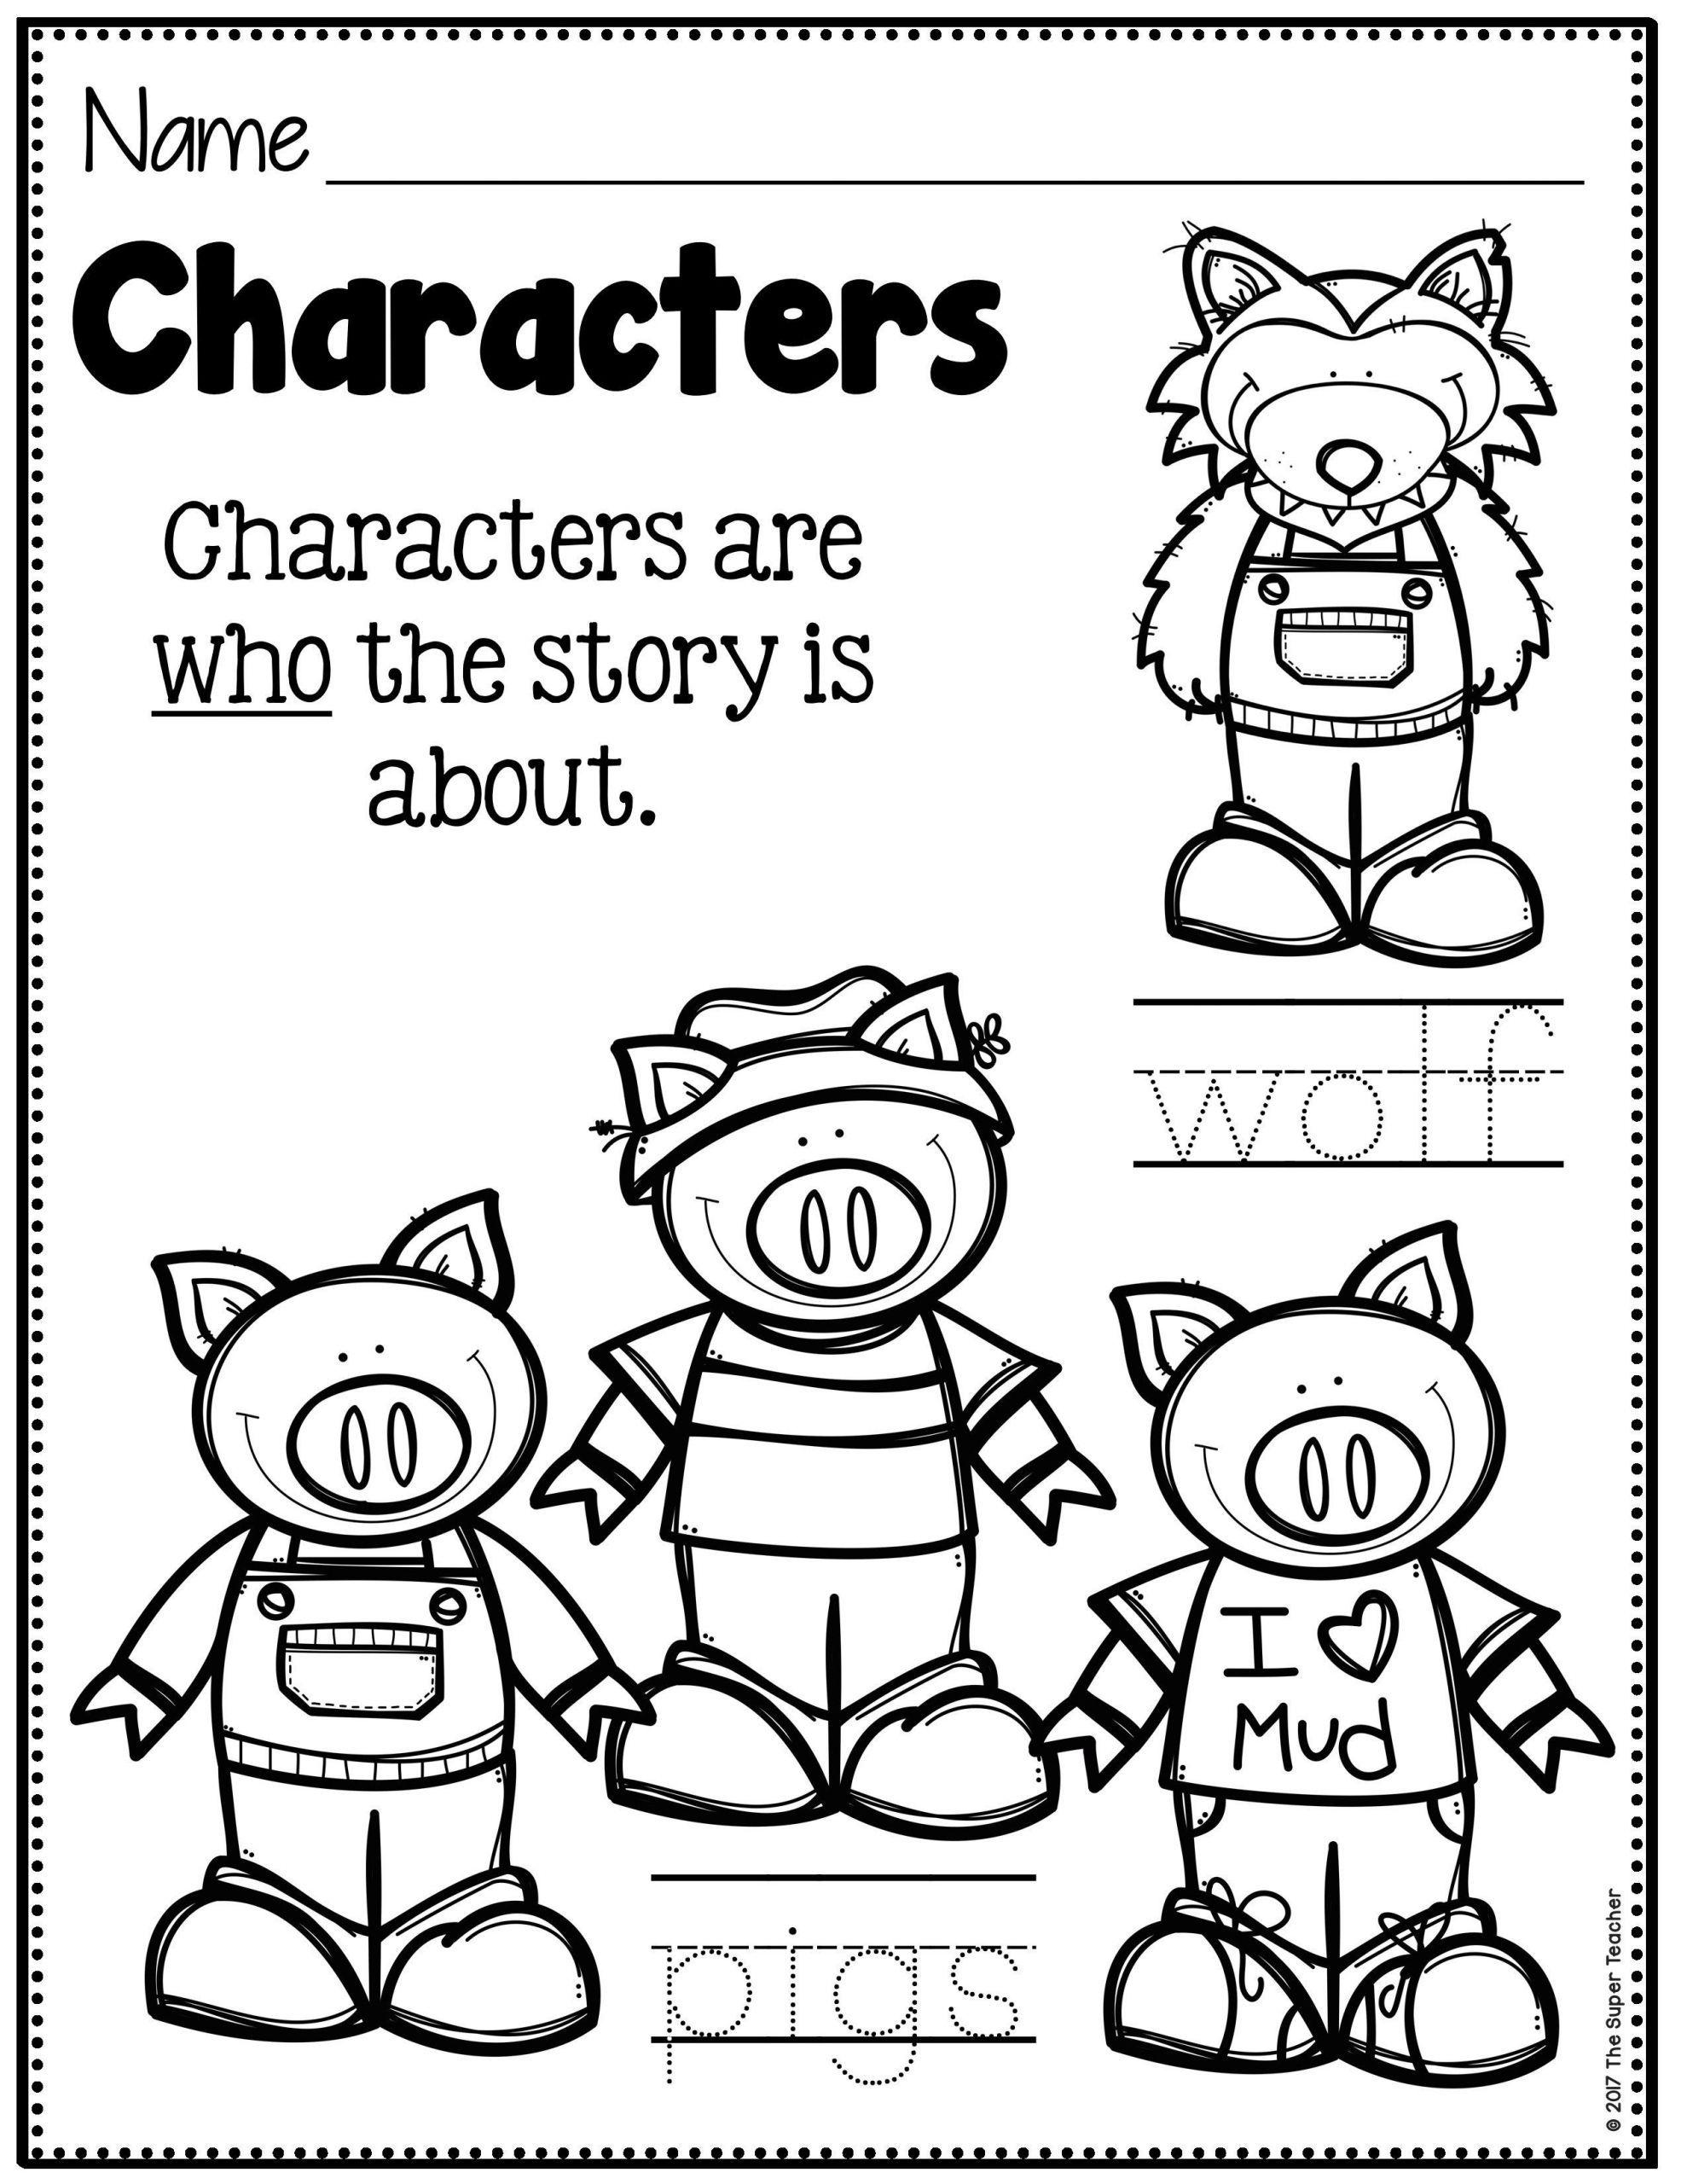 6 Free Math Worksheets First Grade 1 Addition Number Bonds